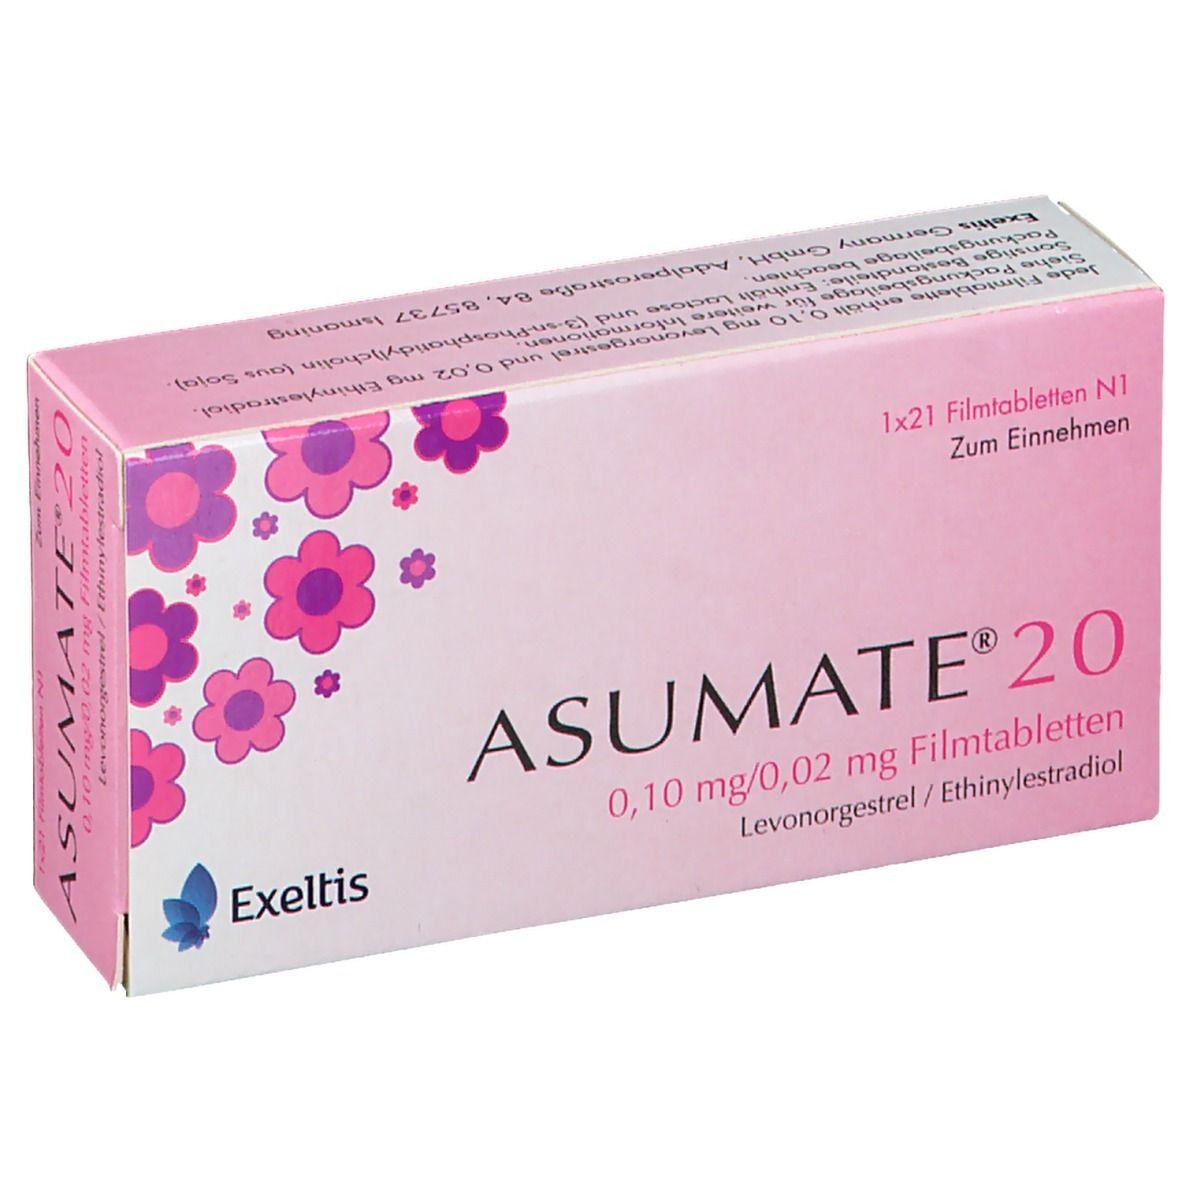 ASUMATE® 20 21 St - shop-apotheke.com